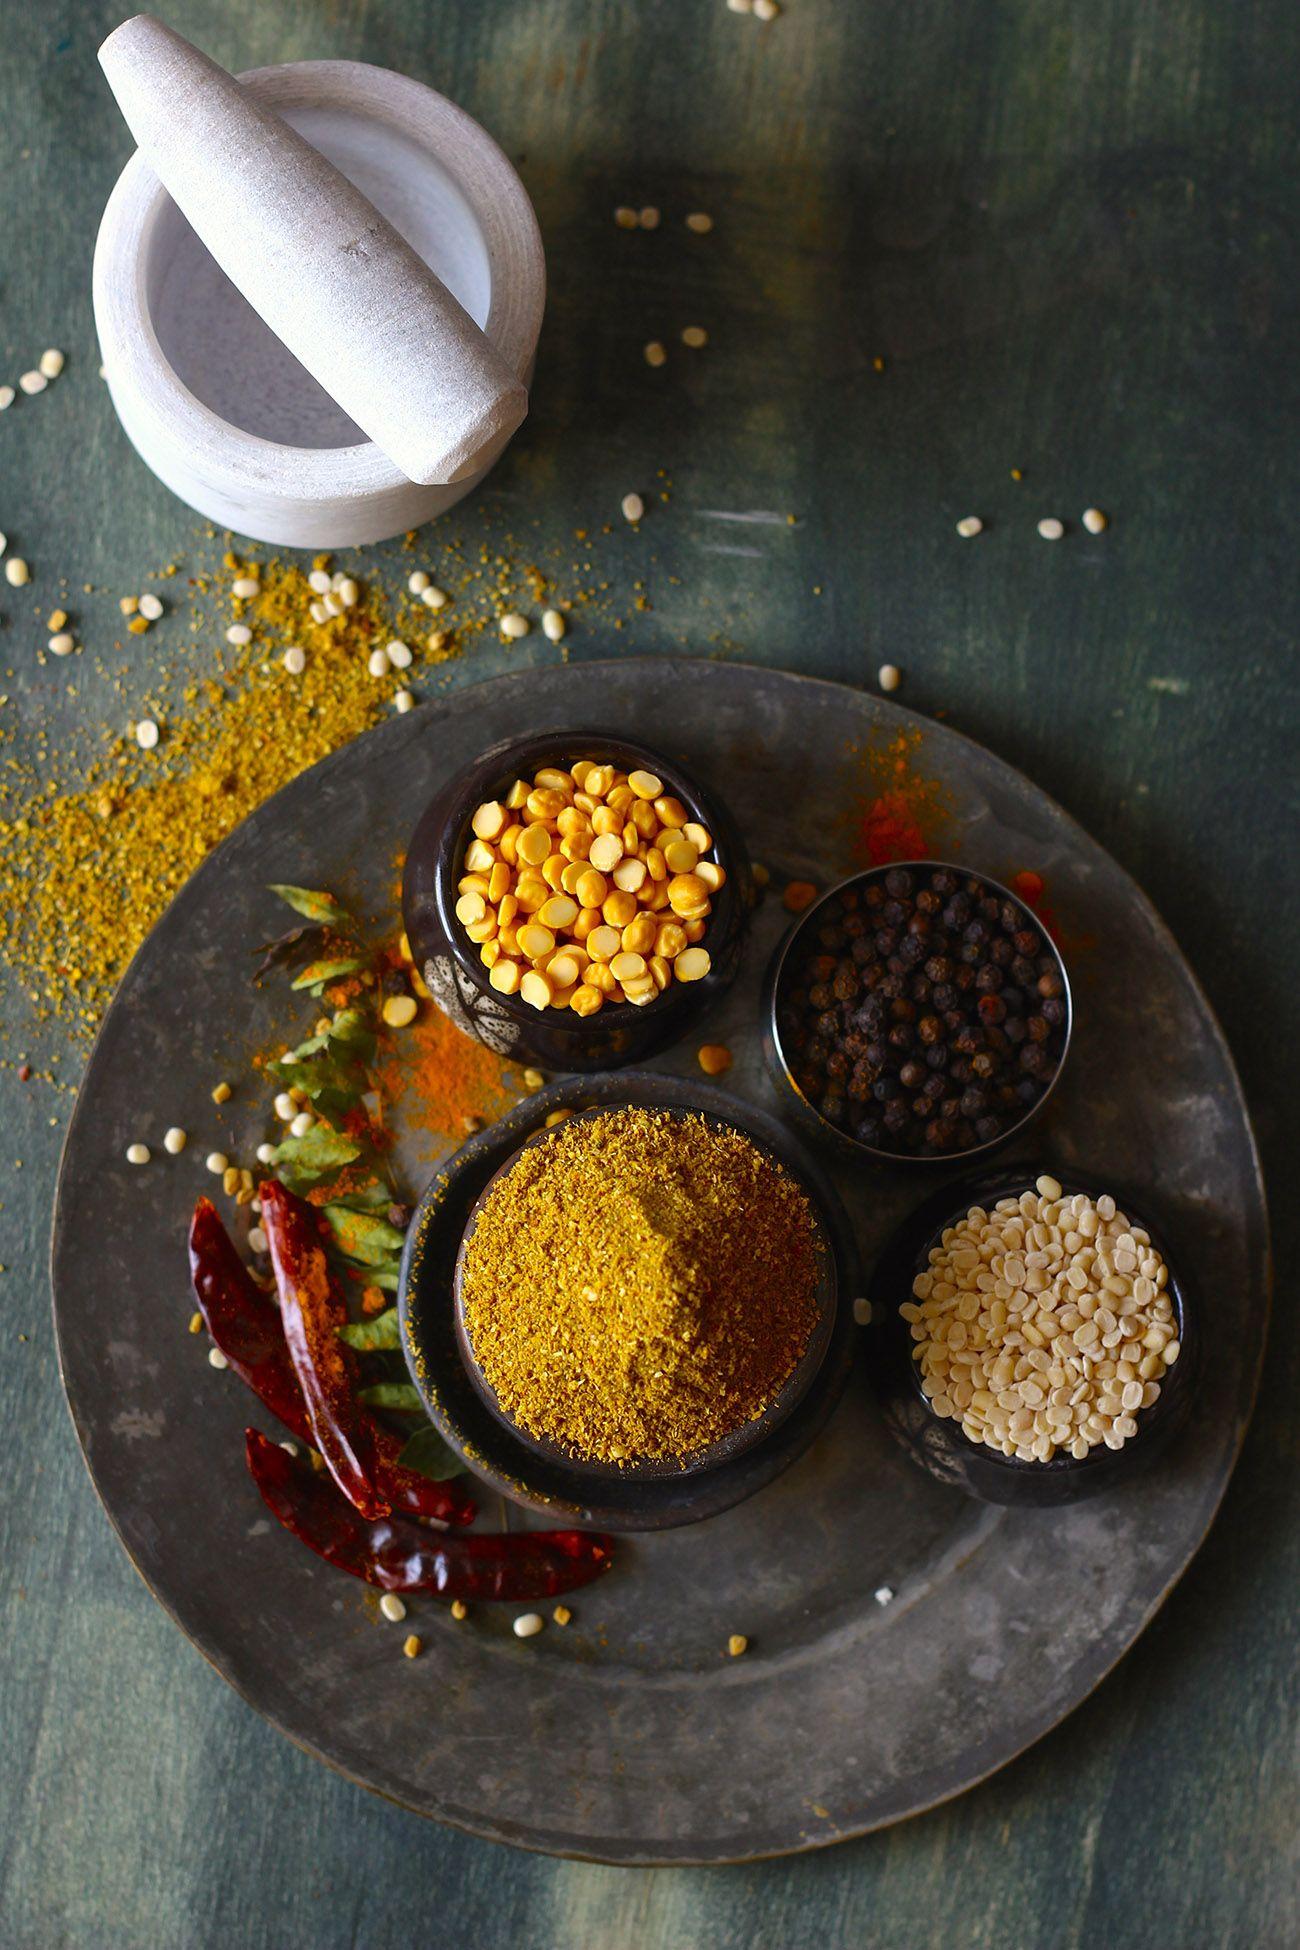 Homemade sambar powder recipe indian cuisine homemade and fun food homemade sambar powder pakistan foodfind recipeindian forumfinder Images